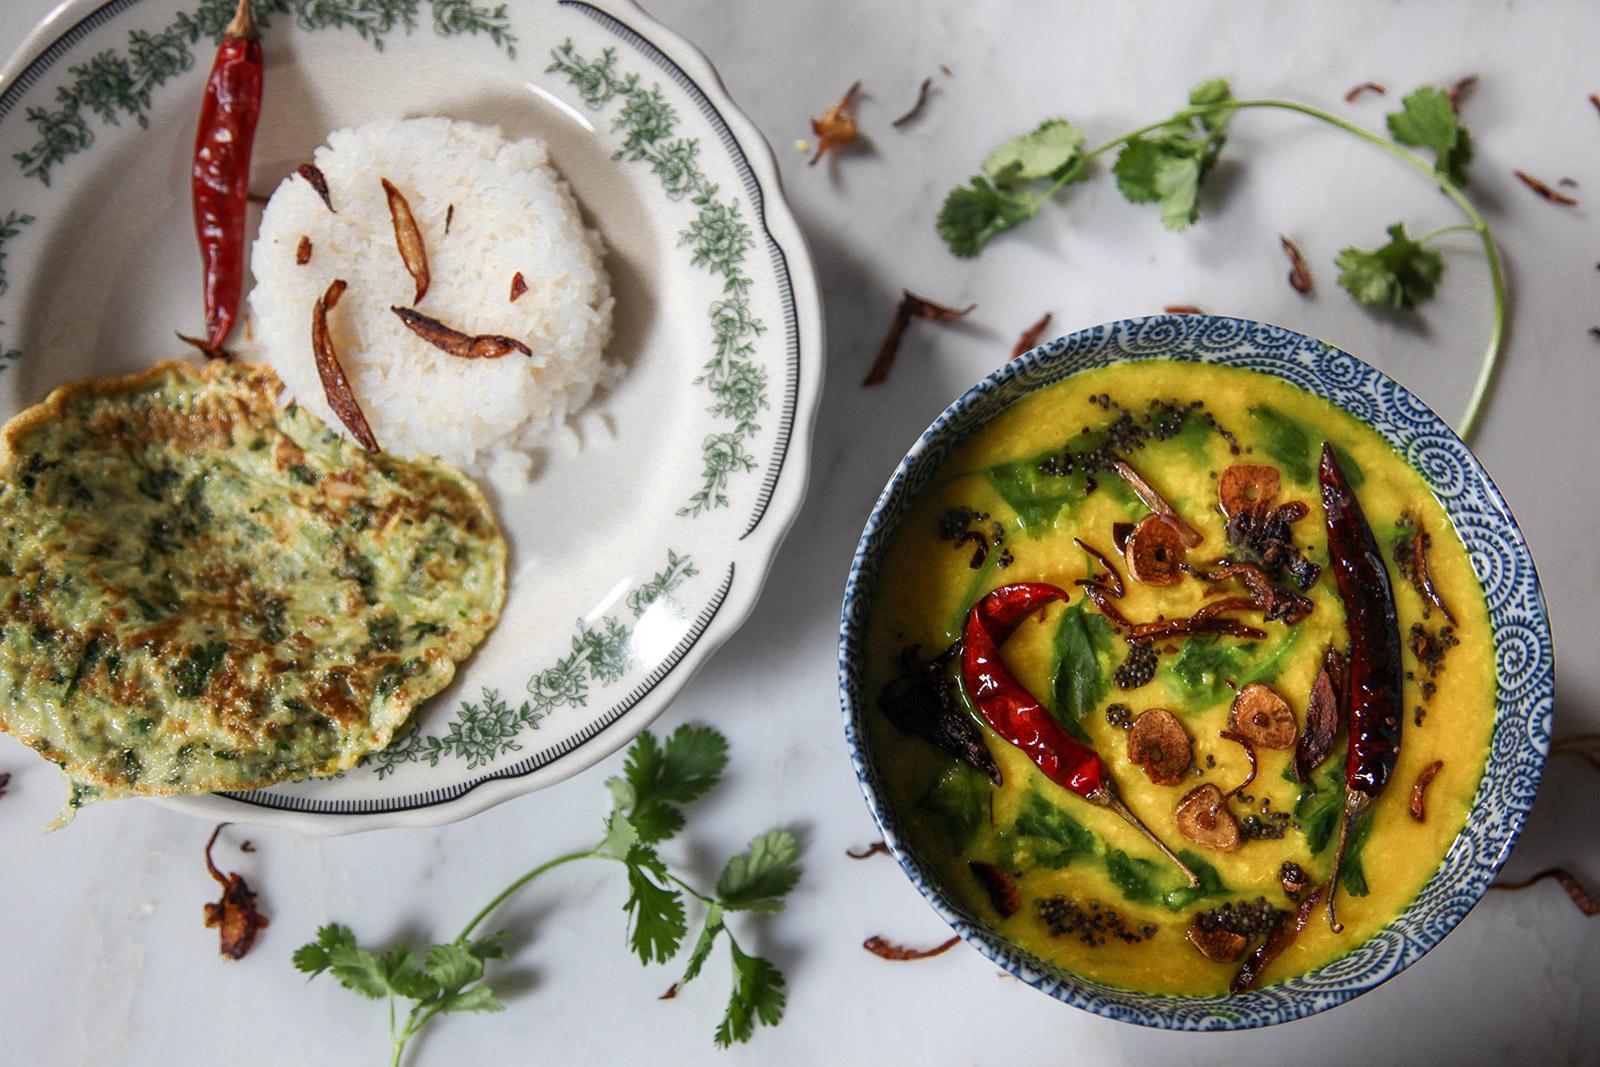 Golden Yellow Dal (Lentil Soup) with Turmeric, Garlic, Cilantro